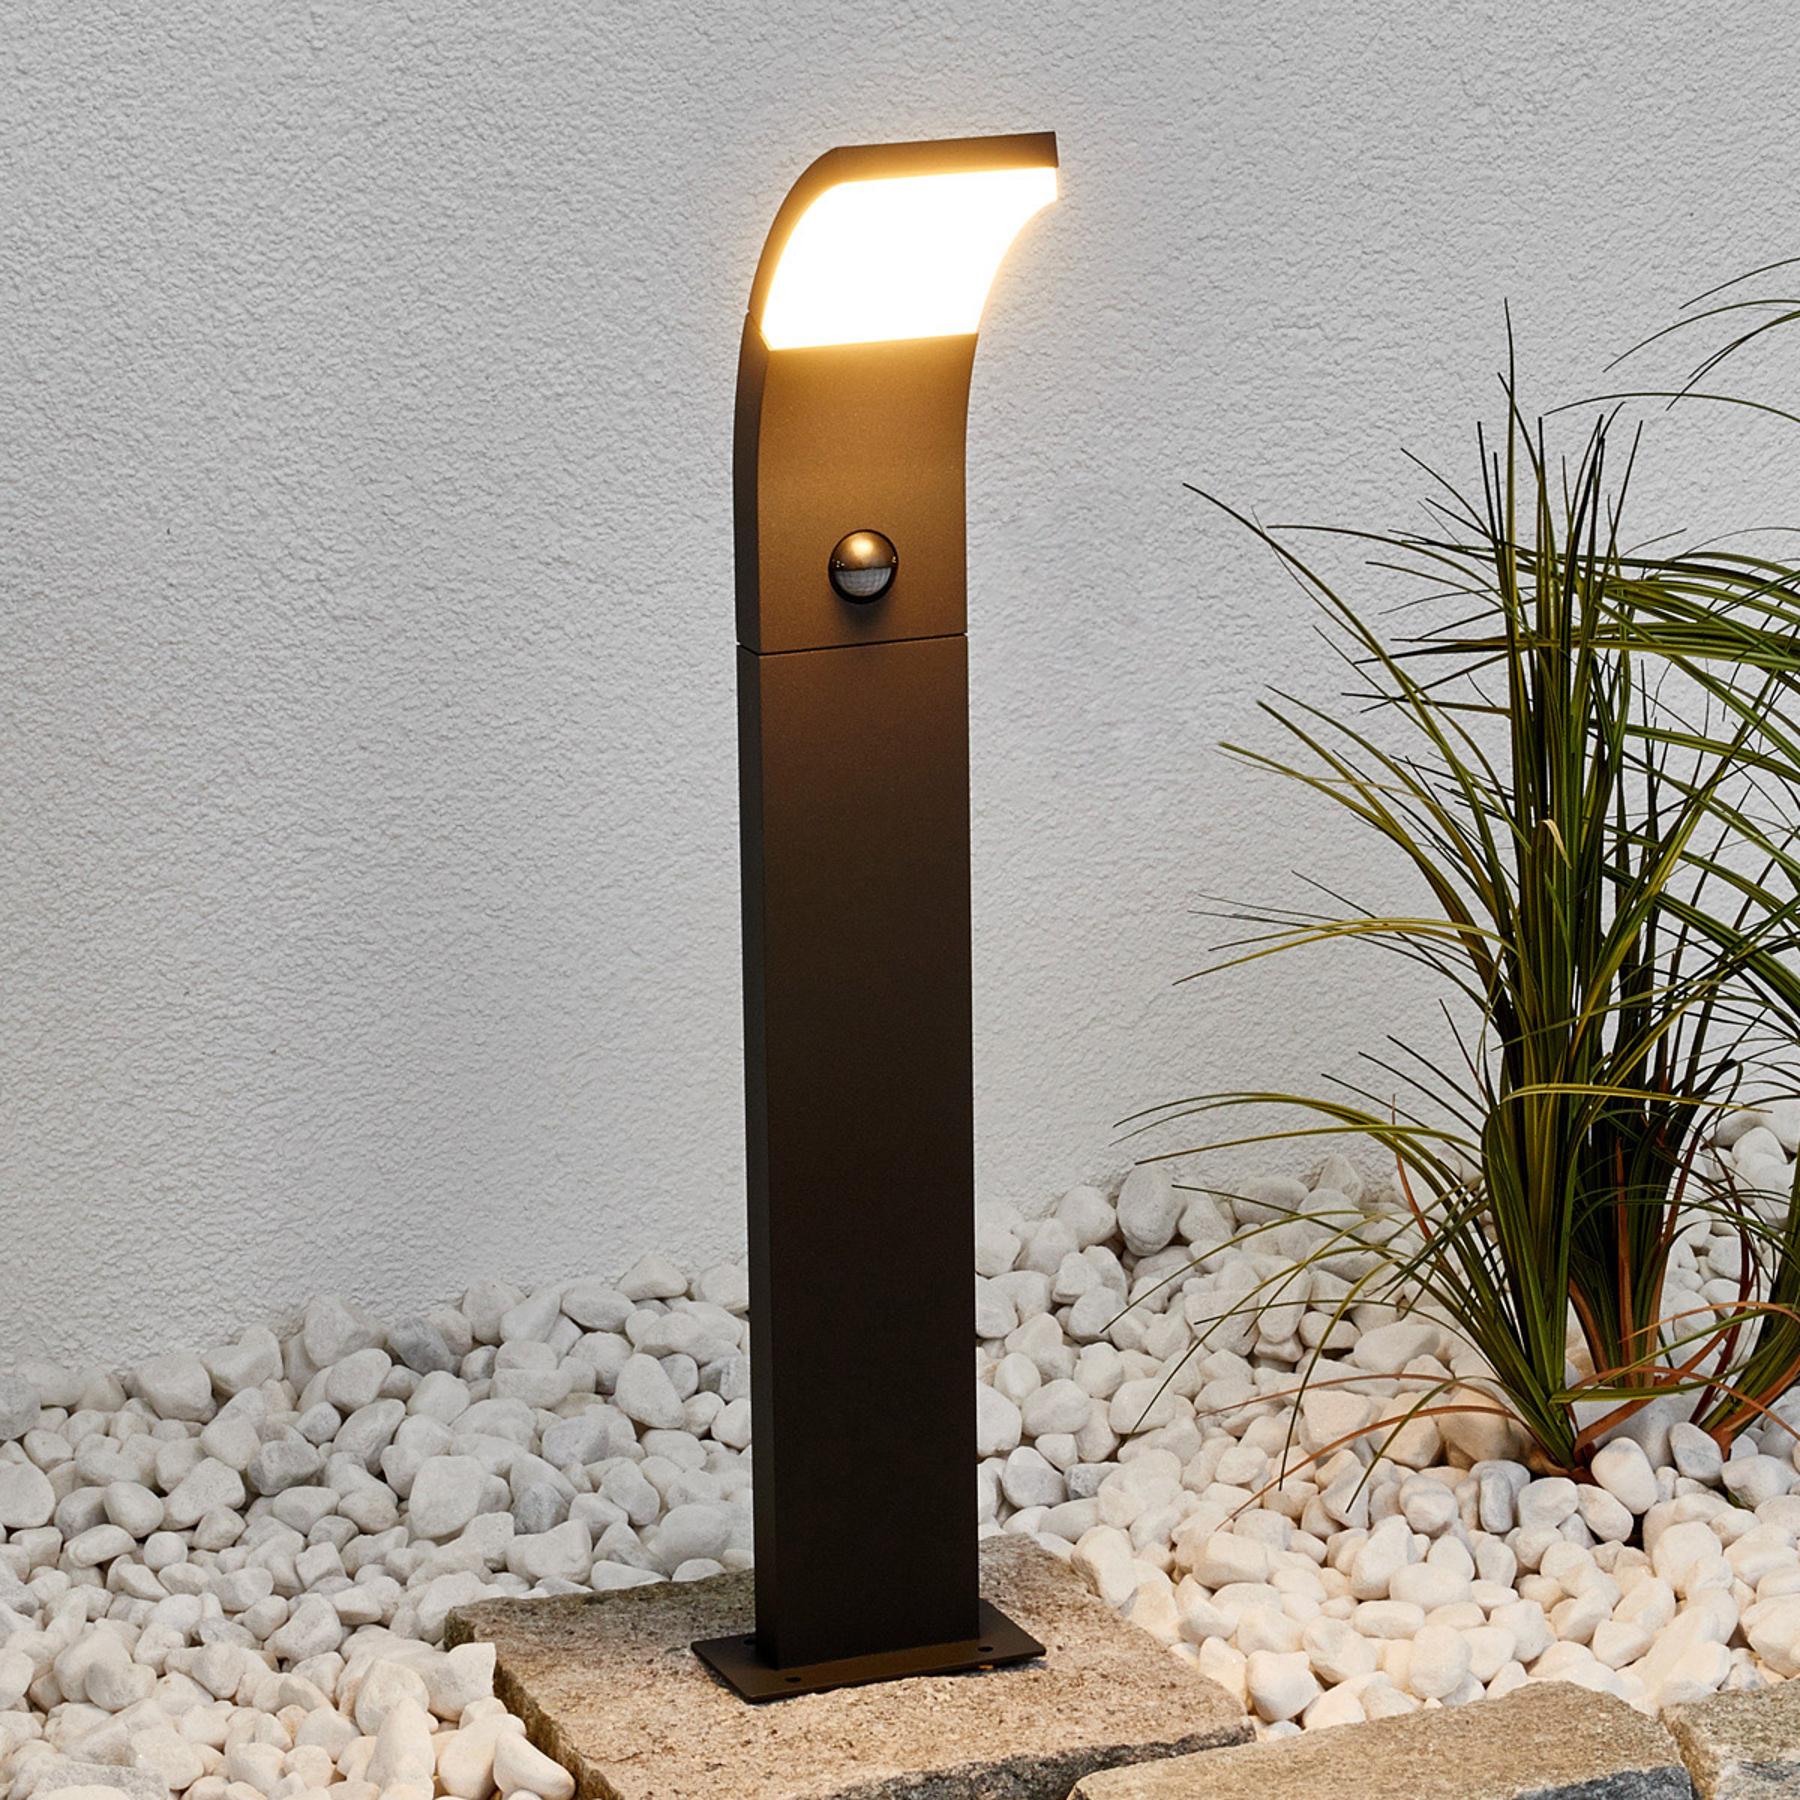 Timm - LED-tuinpadverlichting met sensor, 60 cm